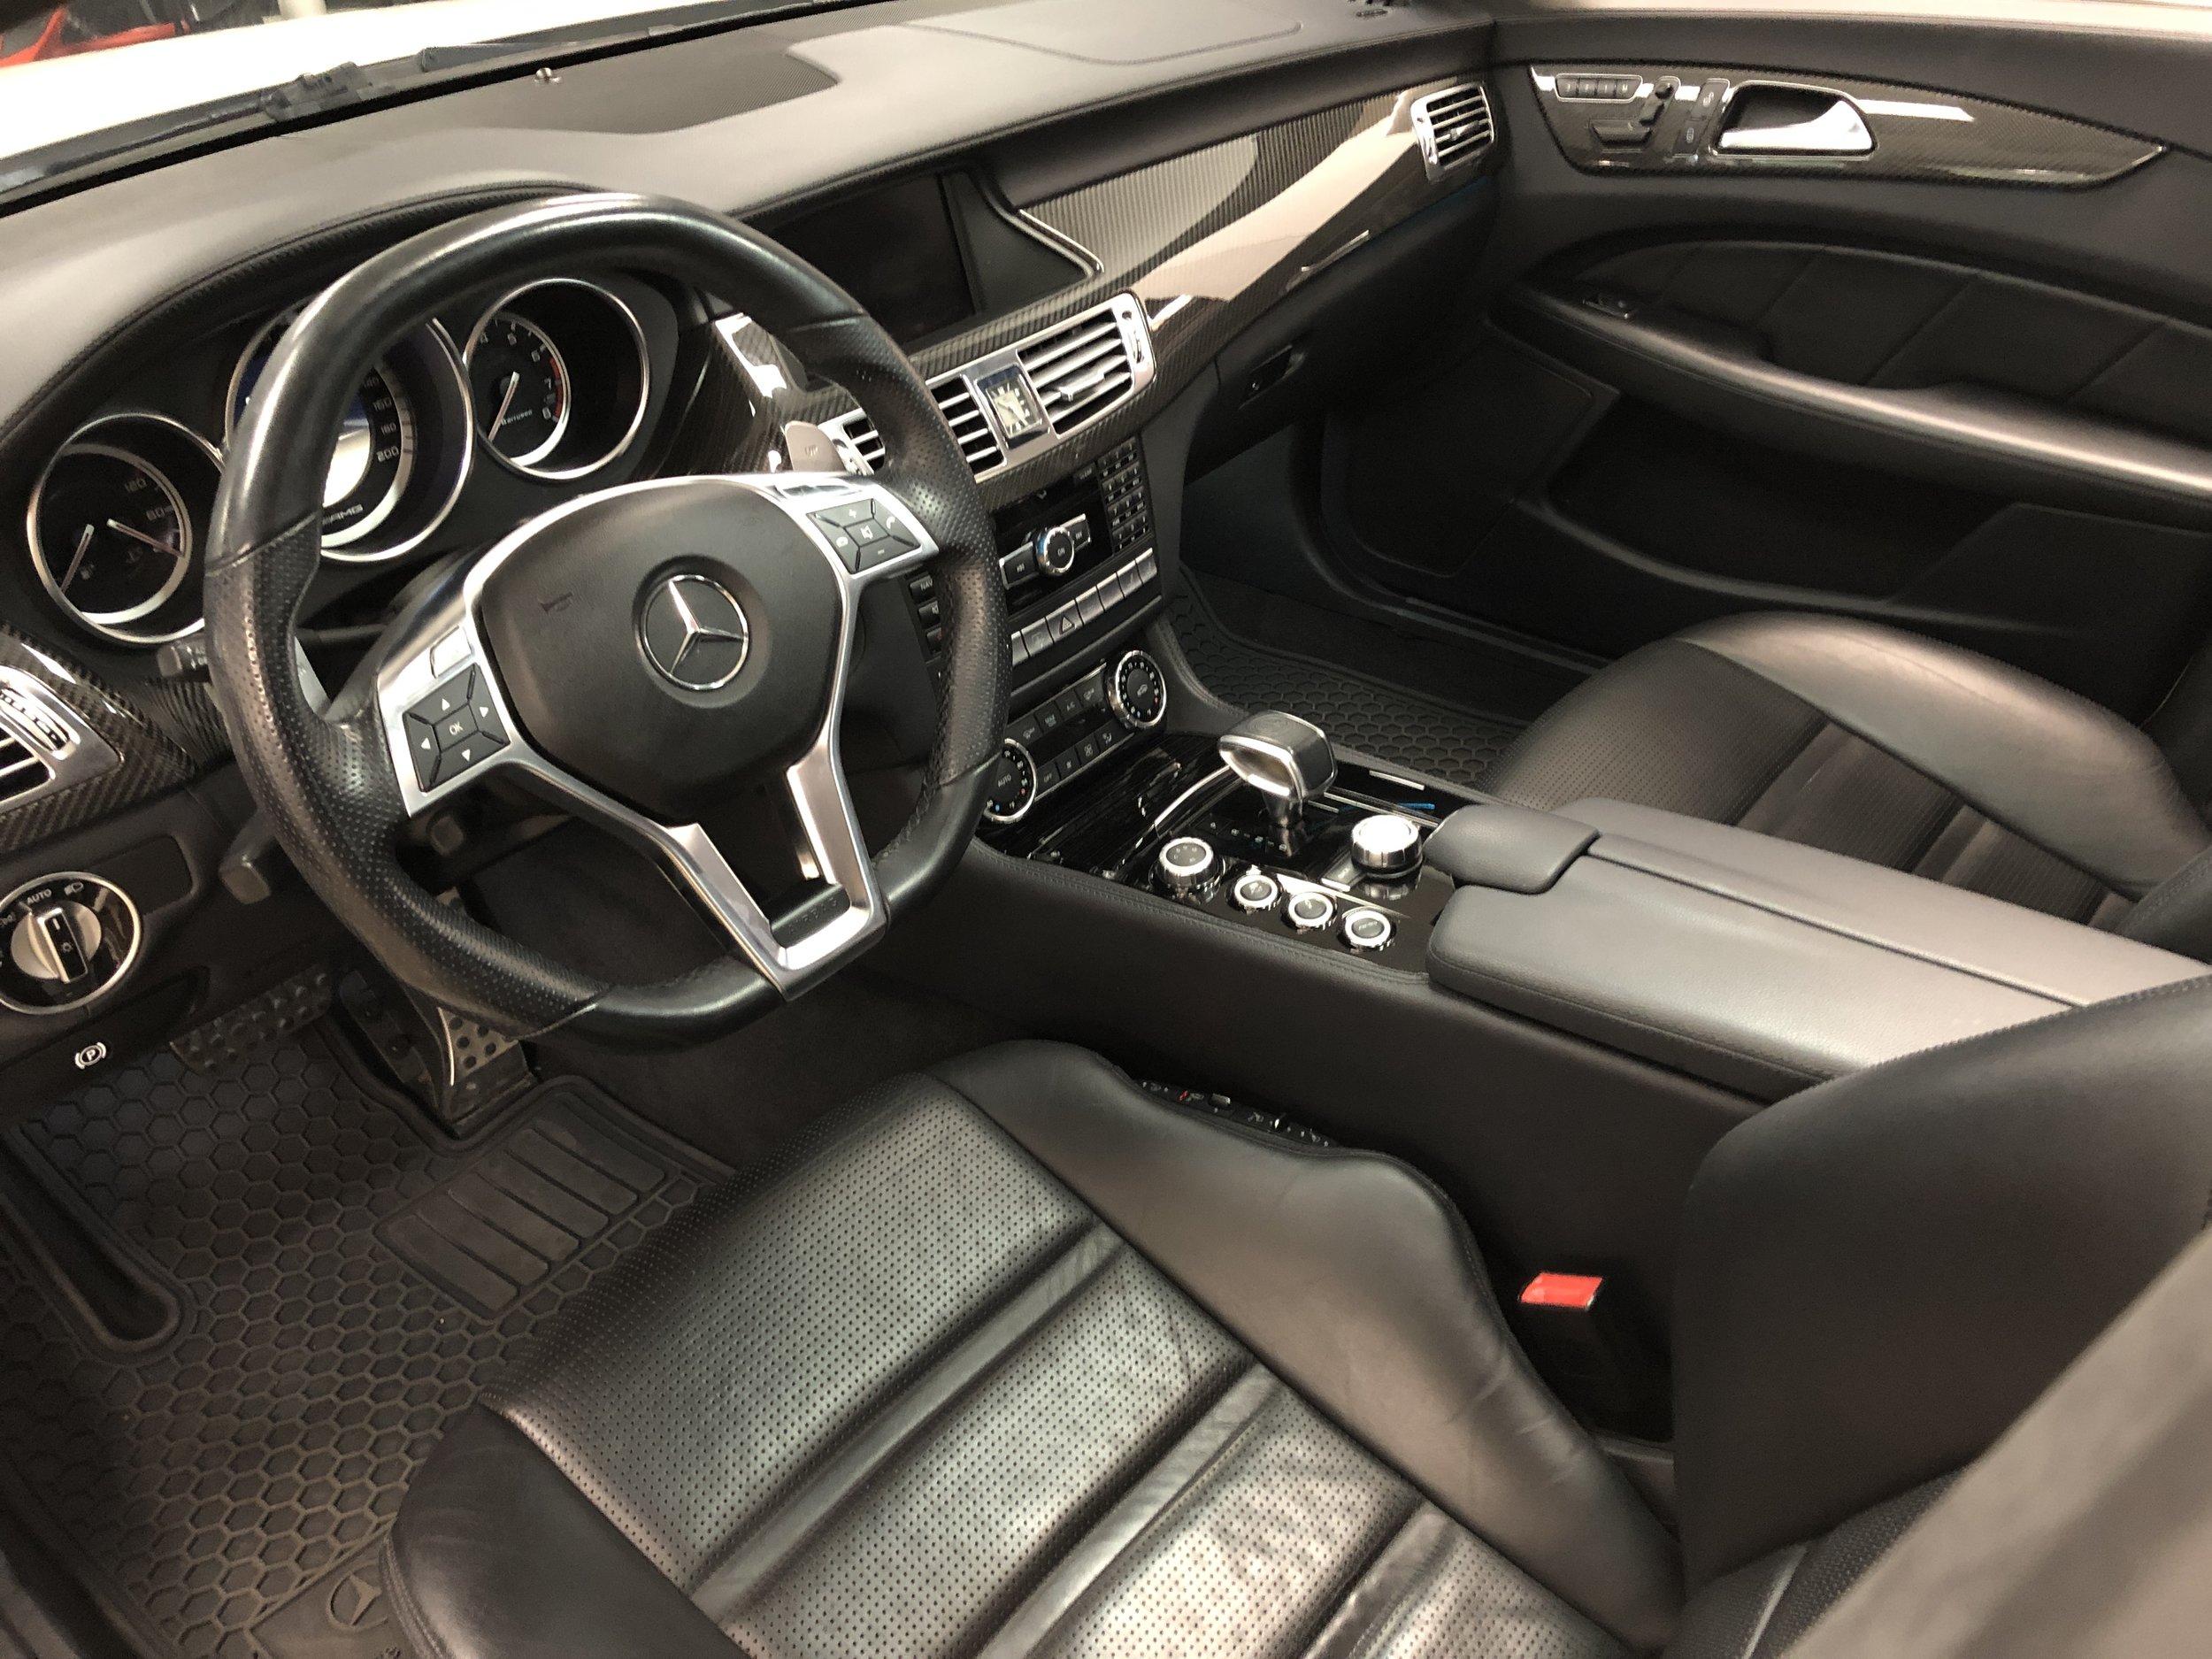 2012 Mercedes-Benz CLS 63 RENNTECH Steering